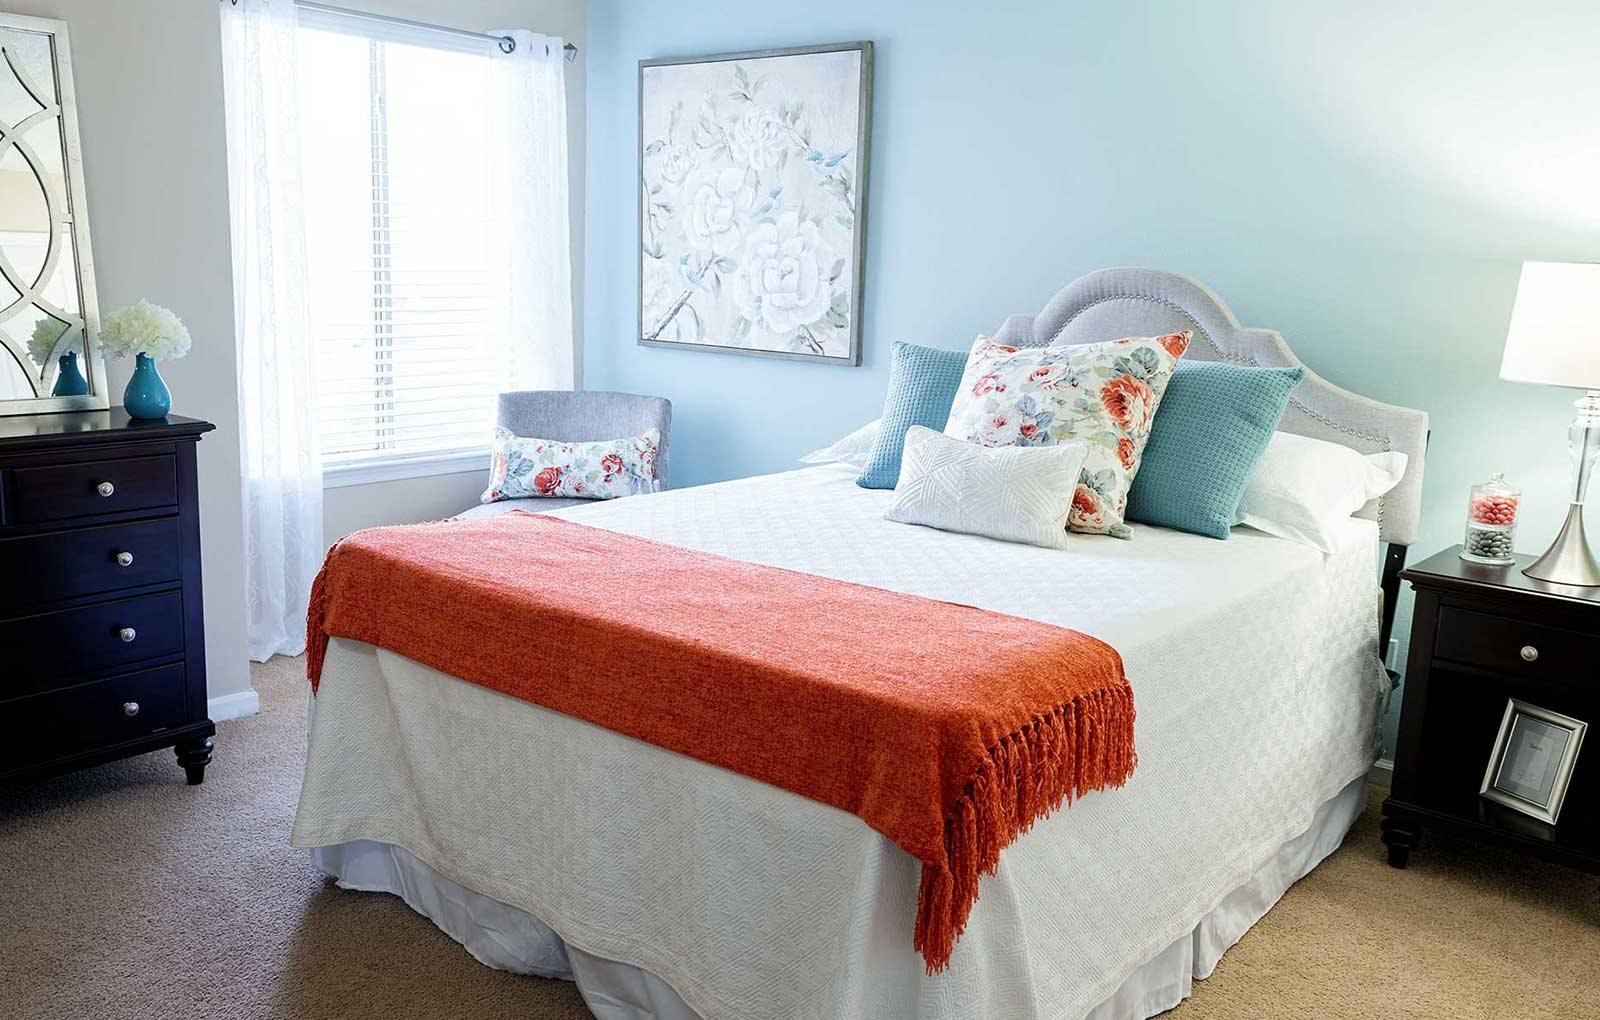 The New Madison at Adams Farm Greensboro, NC Apartments Bedroom